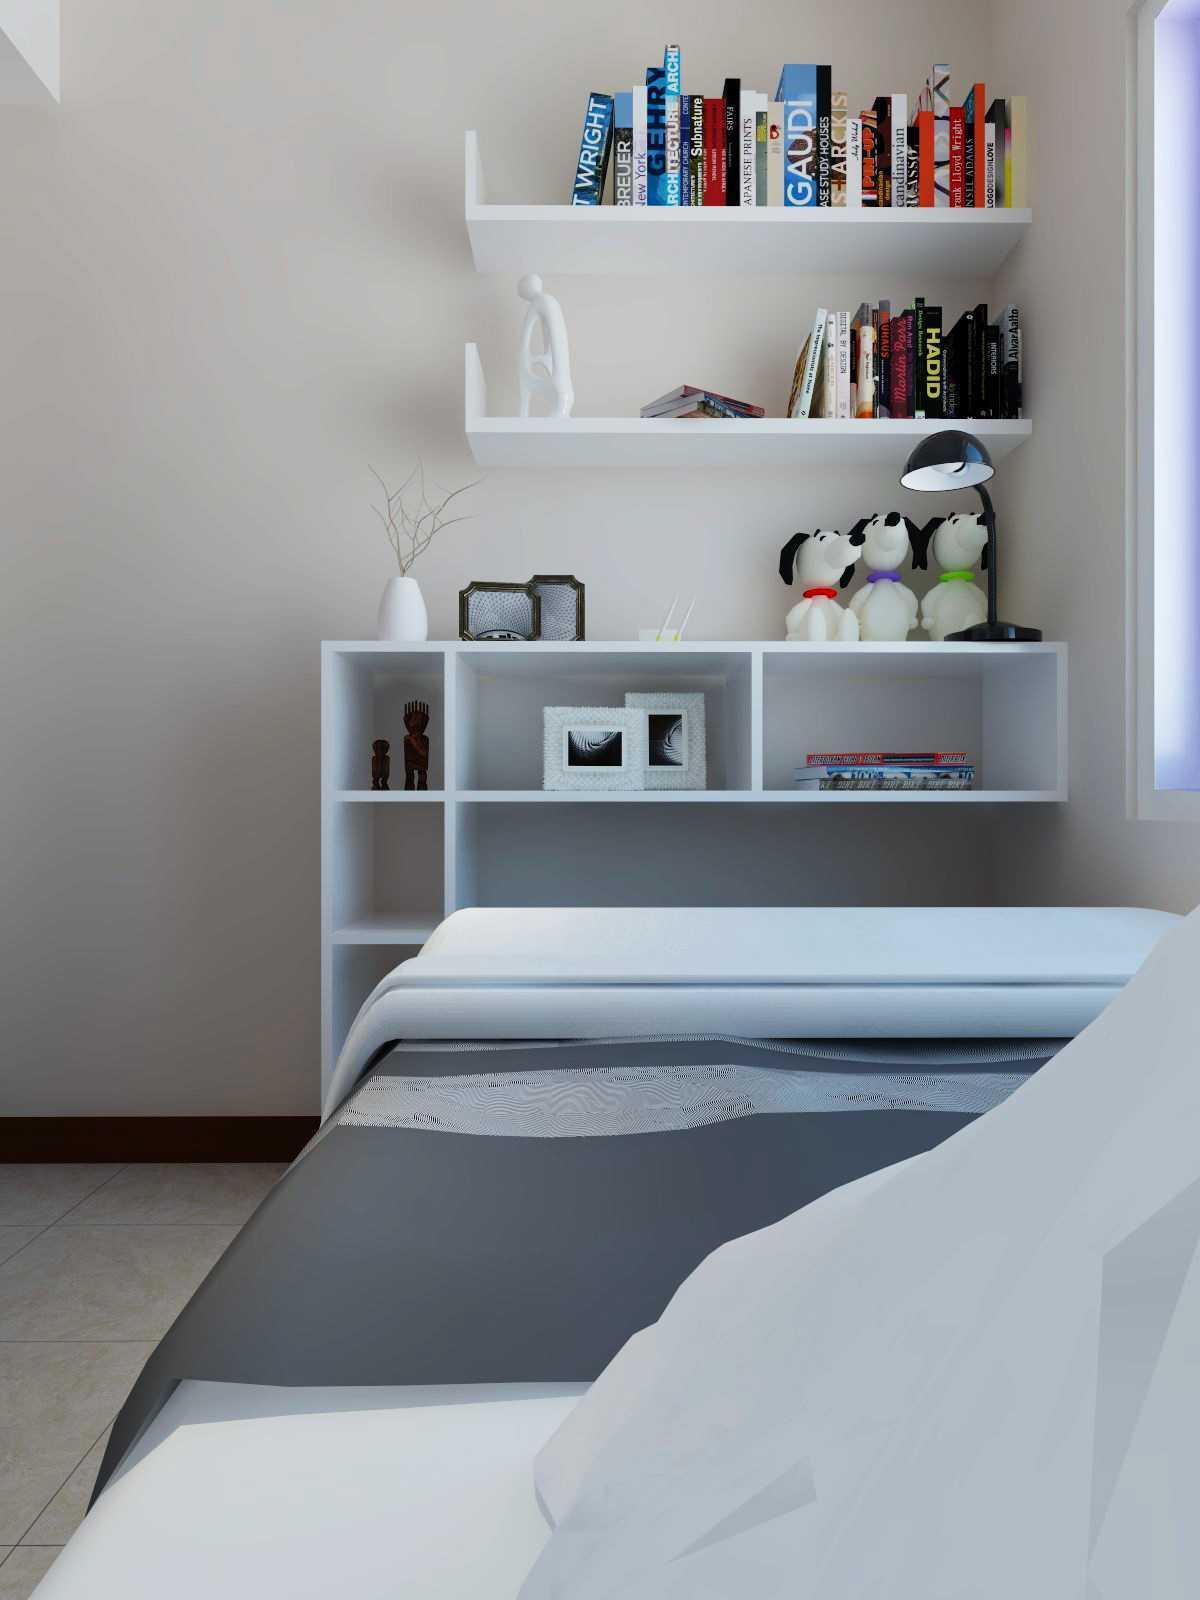 Mbartliving Interior Apartment Mediterania   Mbartliving-Interior-Apartment-Mediterania Minimalist <P>Book Shelve</p> 56453